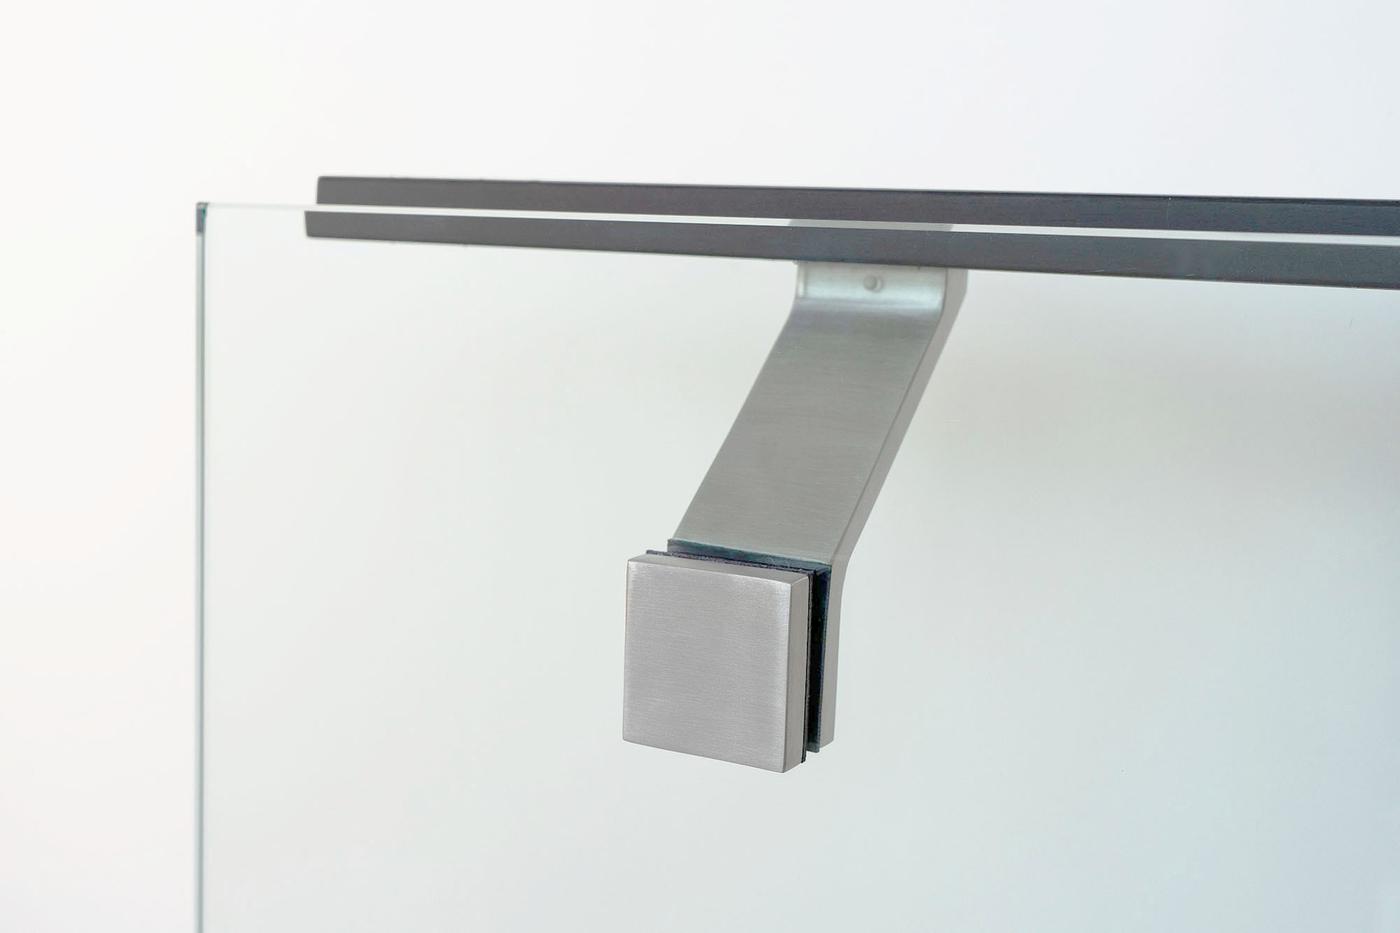 Modern-glass-mounted-stainless-steel-handrail-bracket